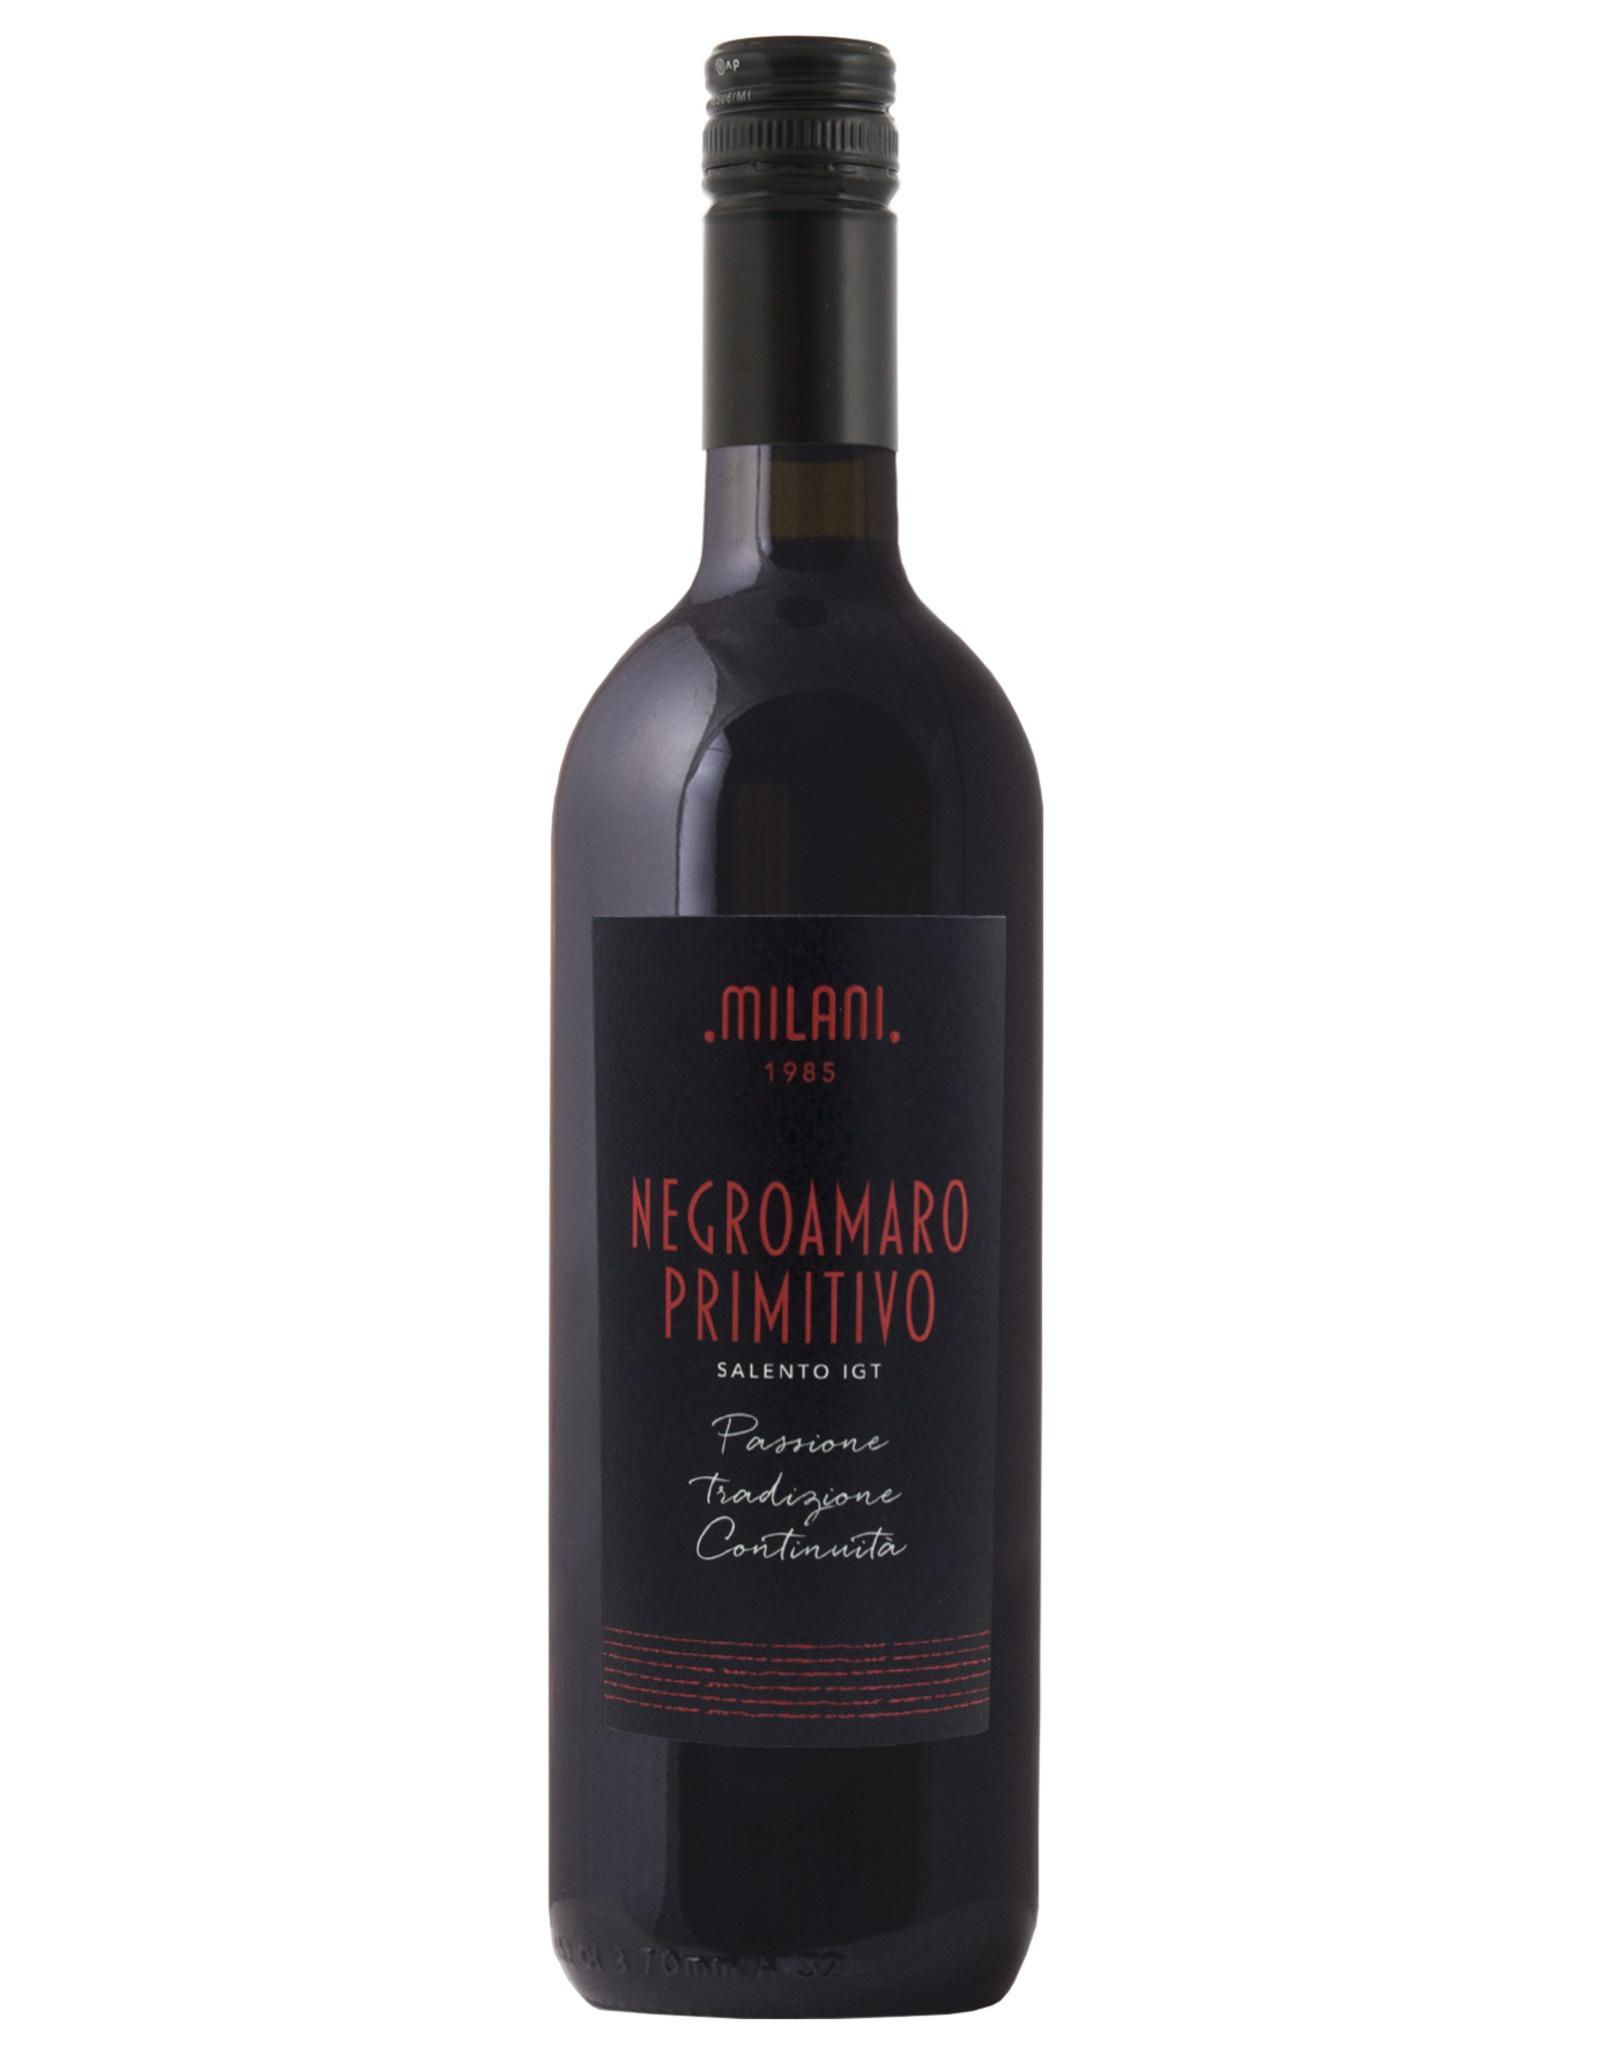 Proef Milani Primitivo / Negroamaro